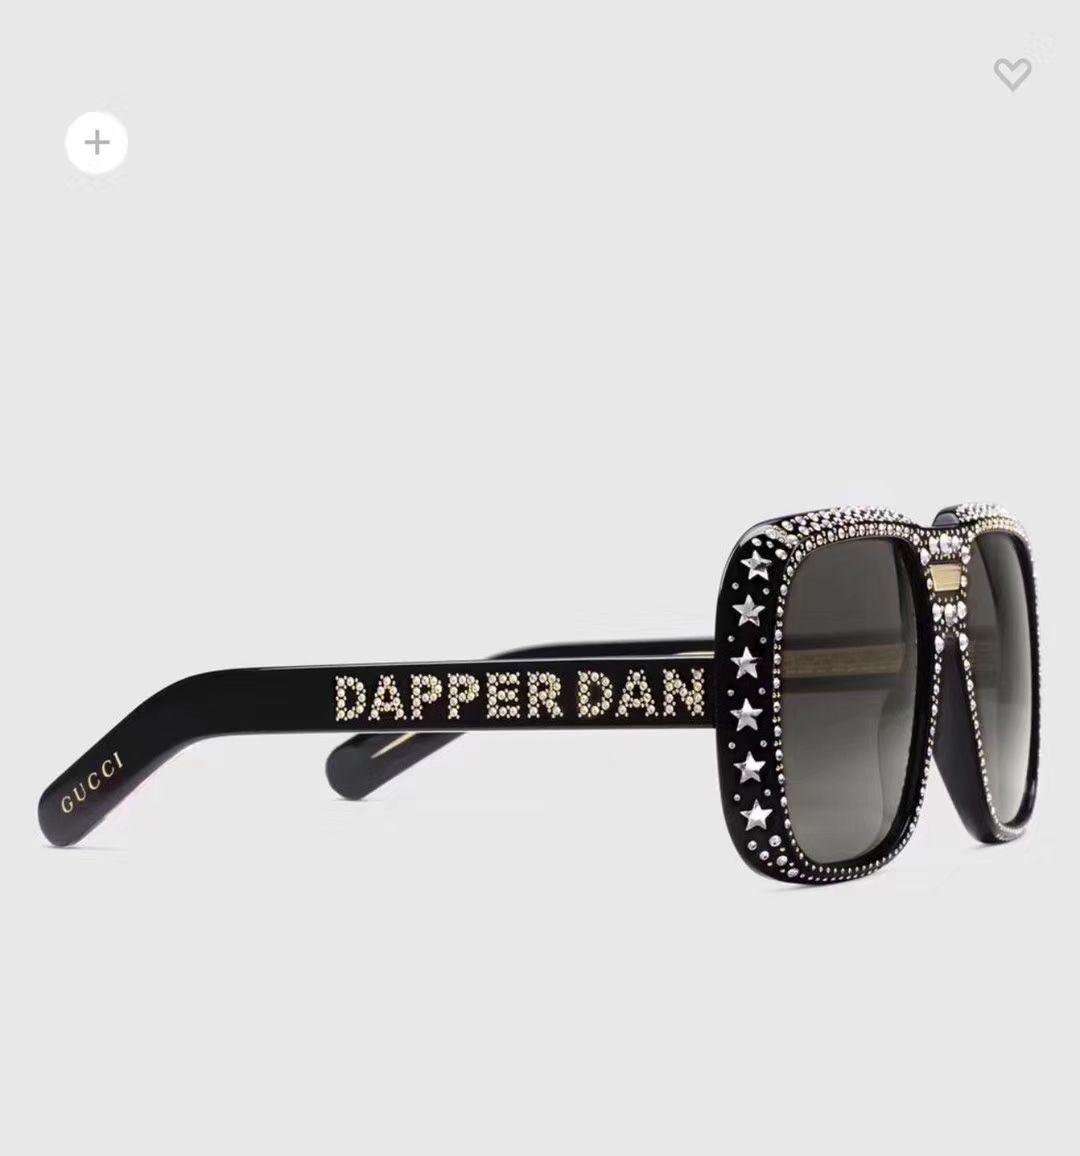 41576416191 New Arrivals 2019 Fashion Classic Brand Sunglasses Men S HD Polarized  Aluminum Driving Luxury Design Sun Glasses For Men UV400 Oculos John Lennon  Sunglasses ...